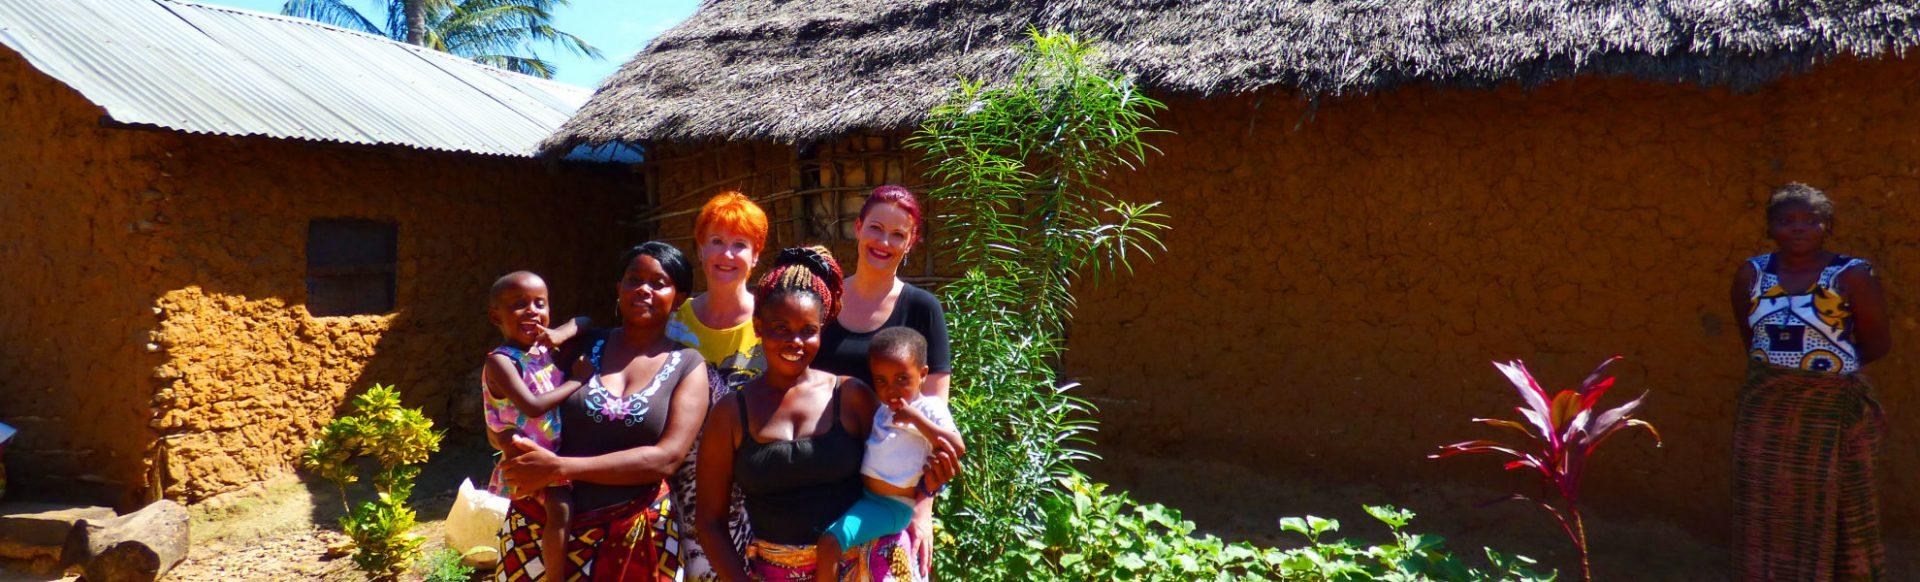 Marina und Judith Schmidt, KeniaSpezialist Reisekontor Schmidt, mit Patenkindern in Kenia